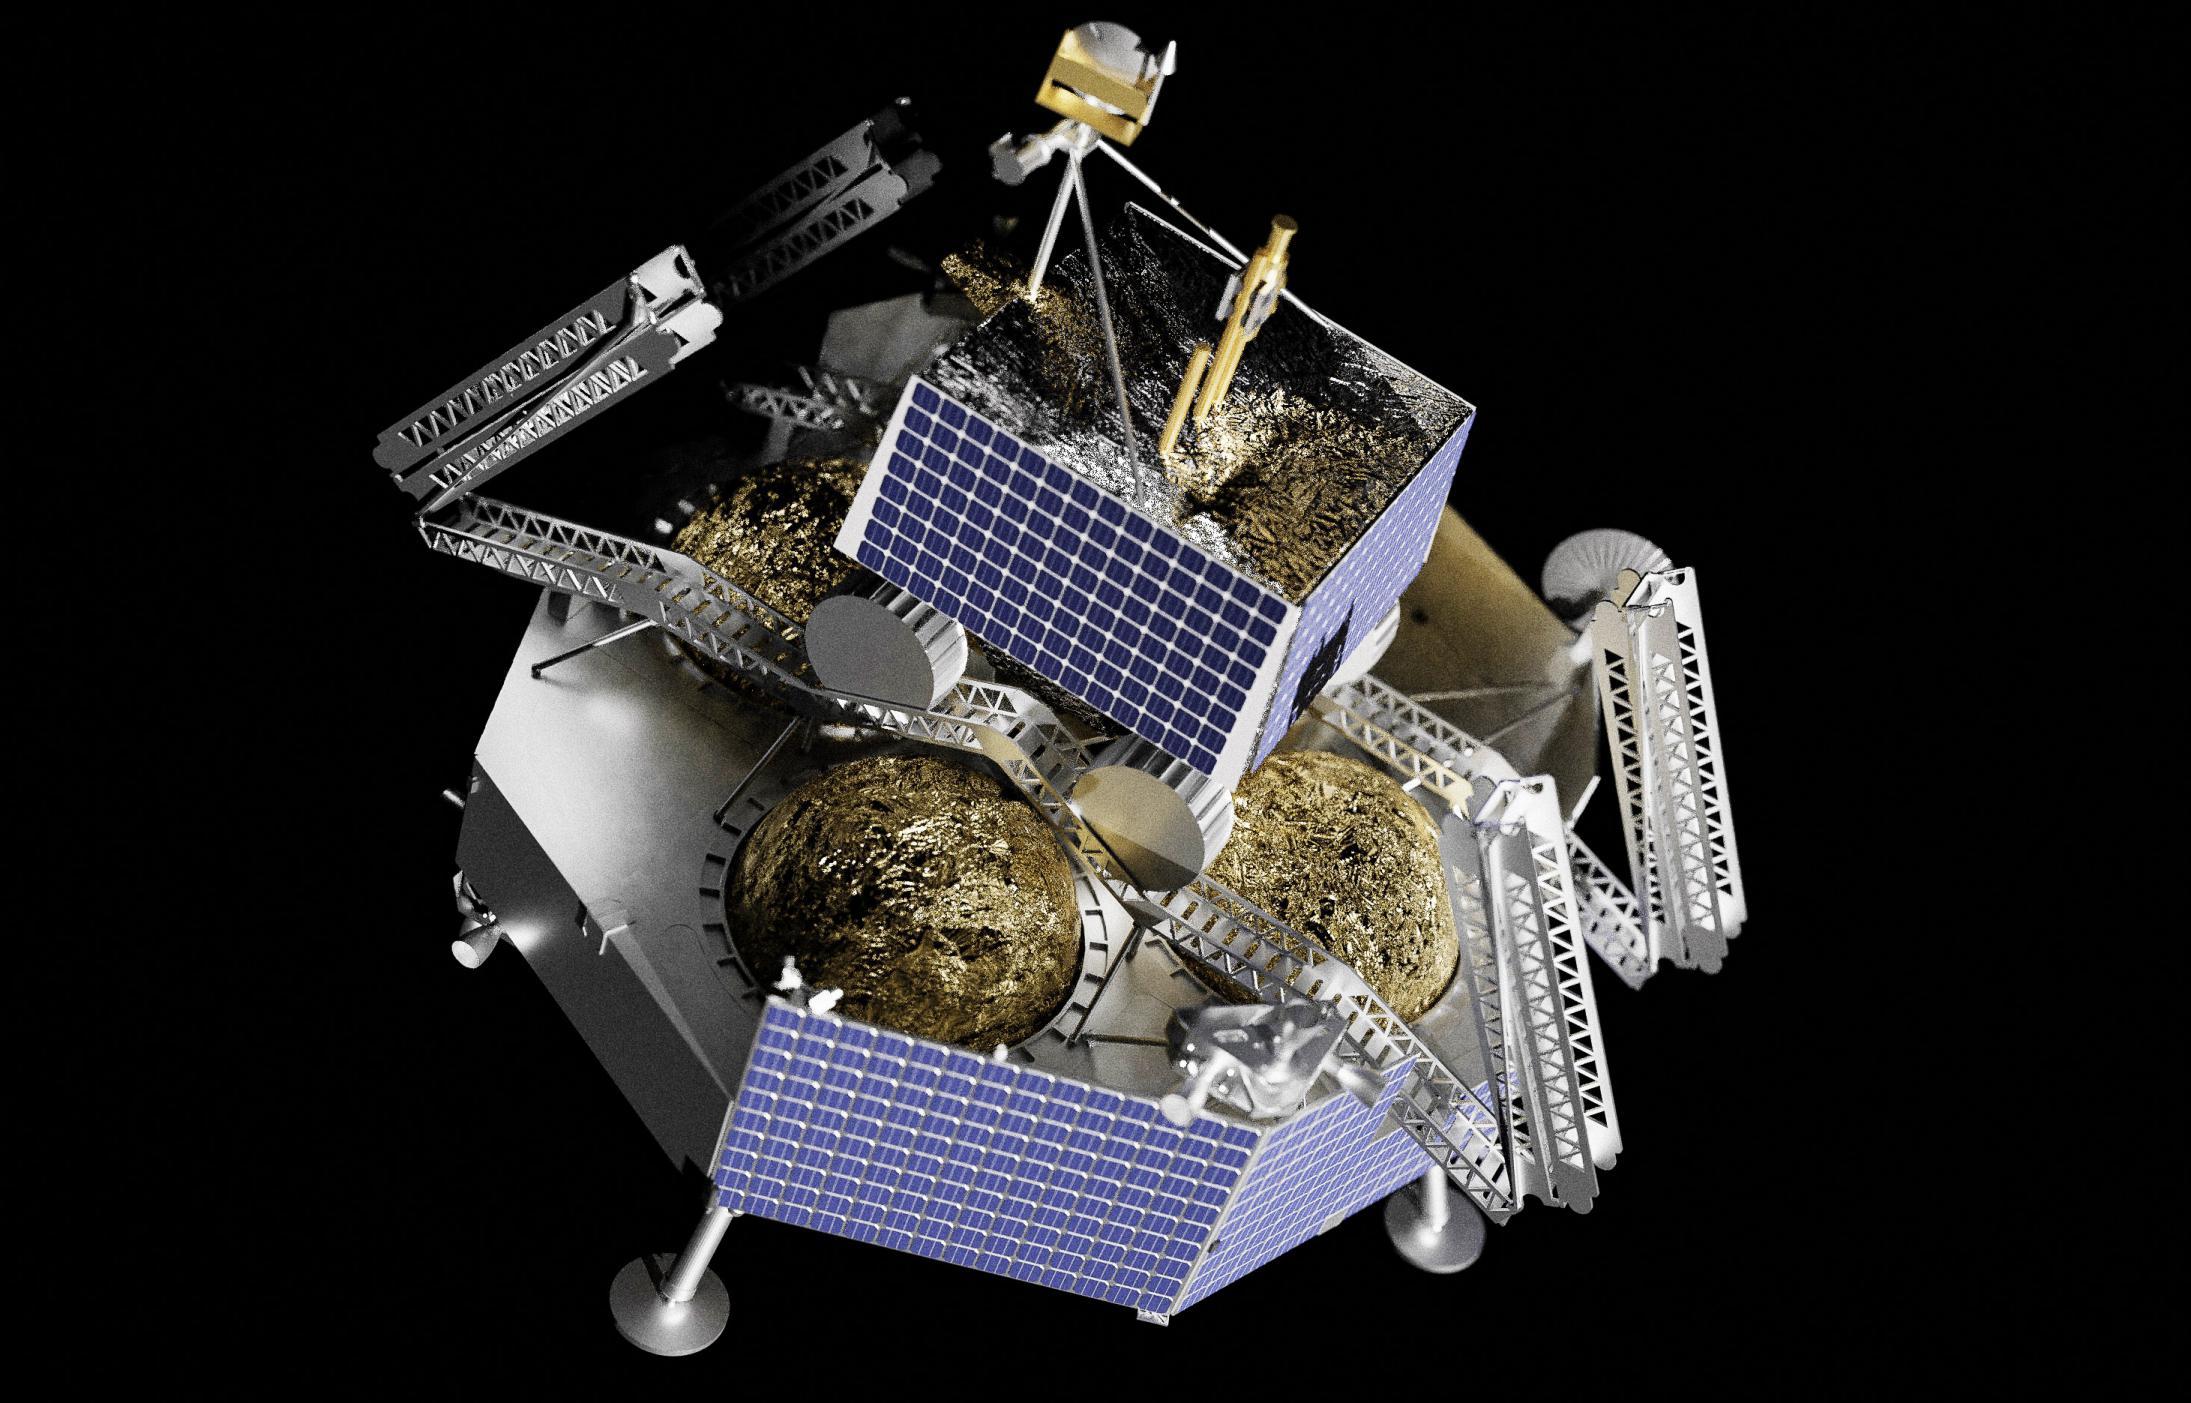 Griffin lander VIPER rover (Astrobotic) 1 (c)